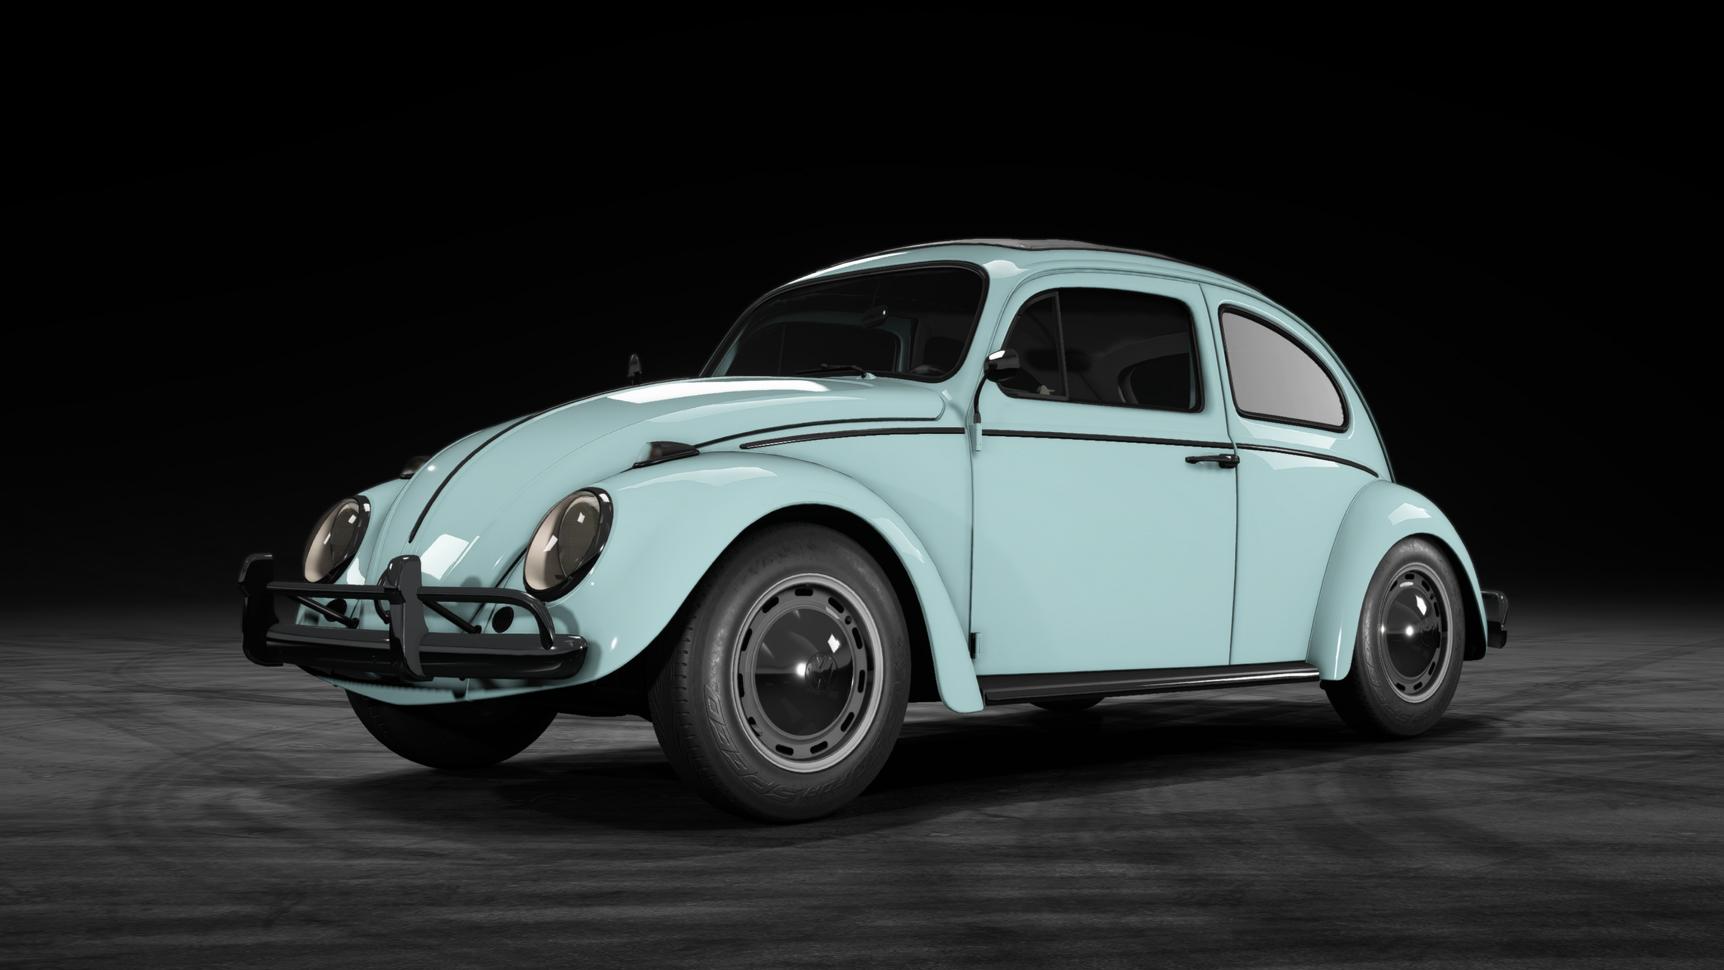 VW 2003 vw bug : Volkswagen Beetle | Need for Speed Wiki | FANDOM powered by Wikia